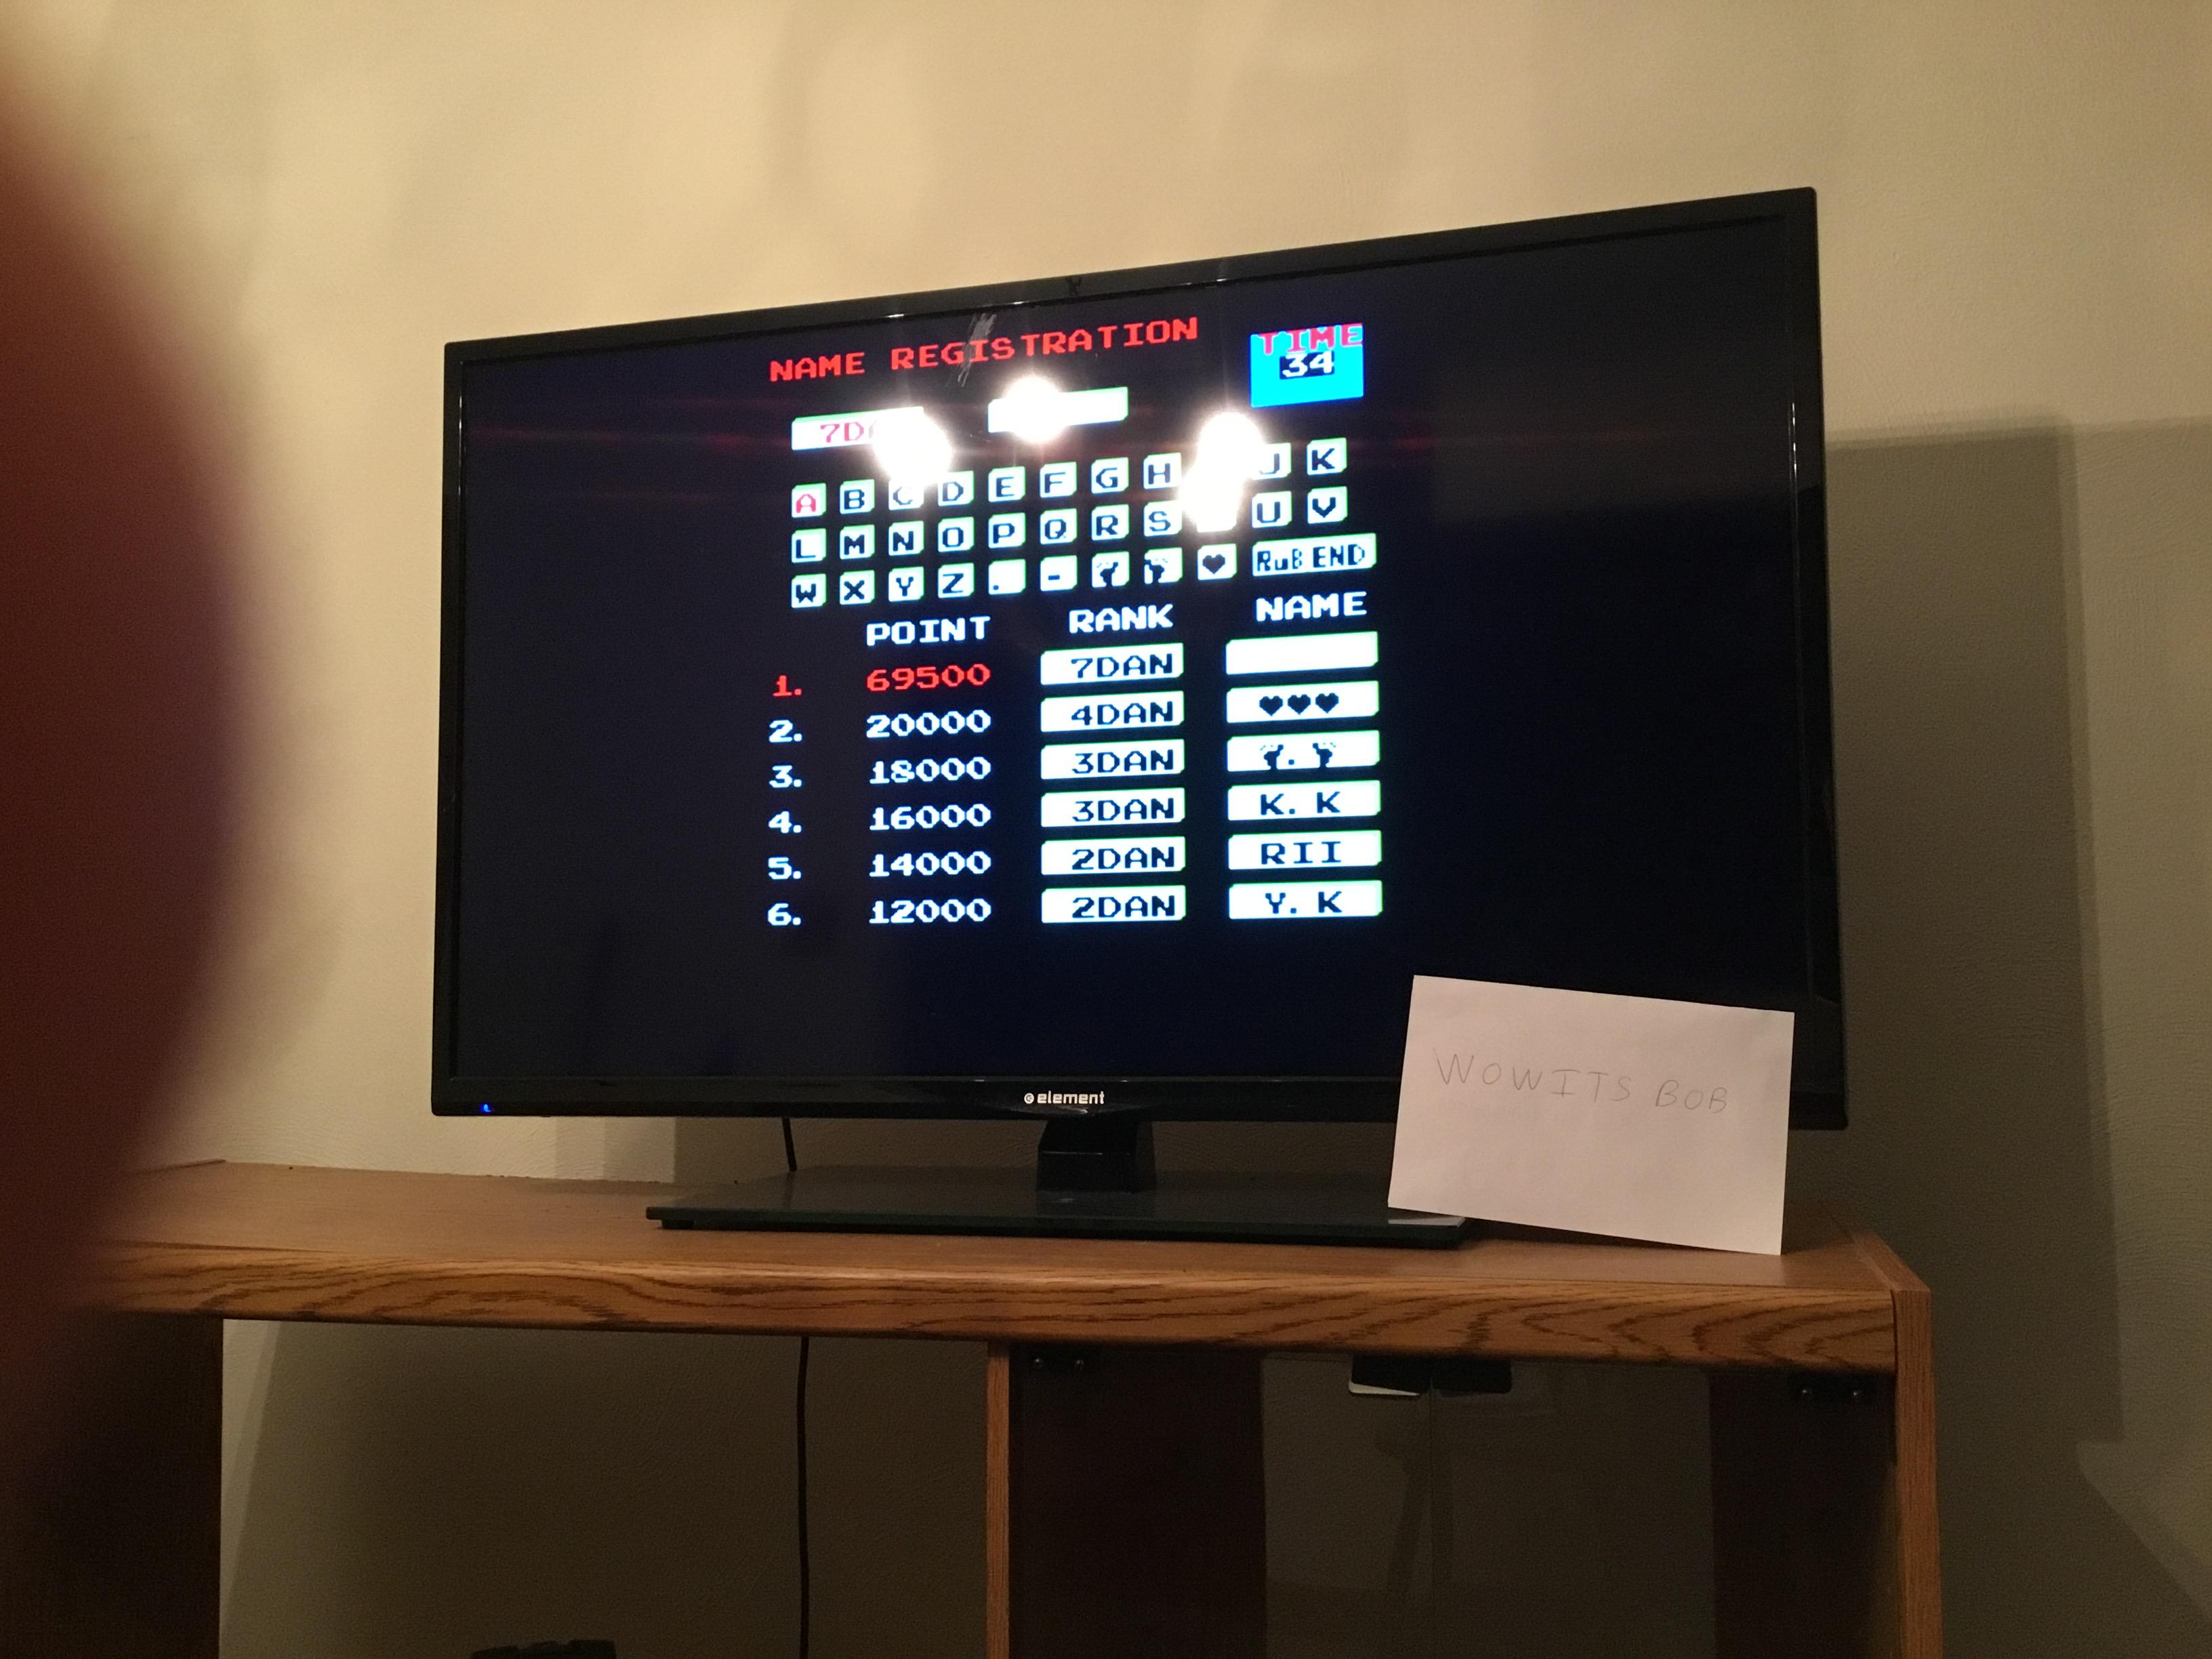 Karate Champ 69,500 points